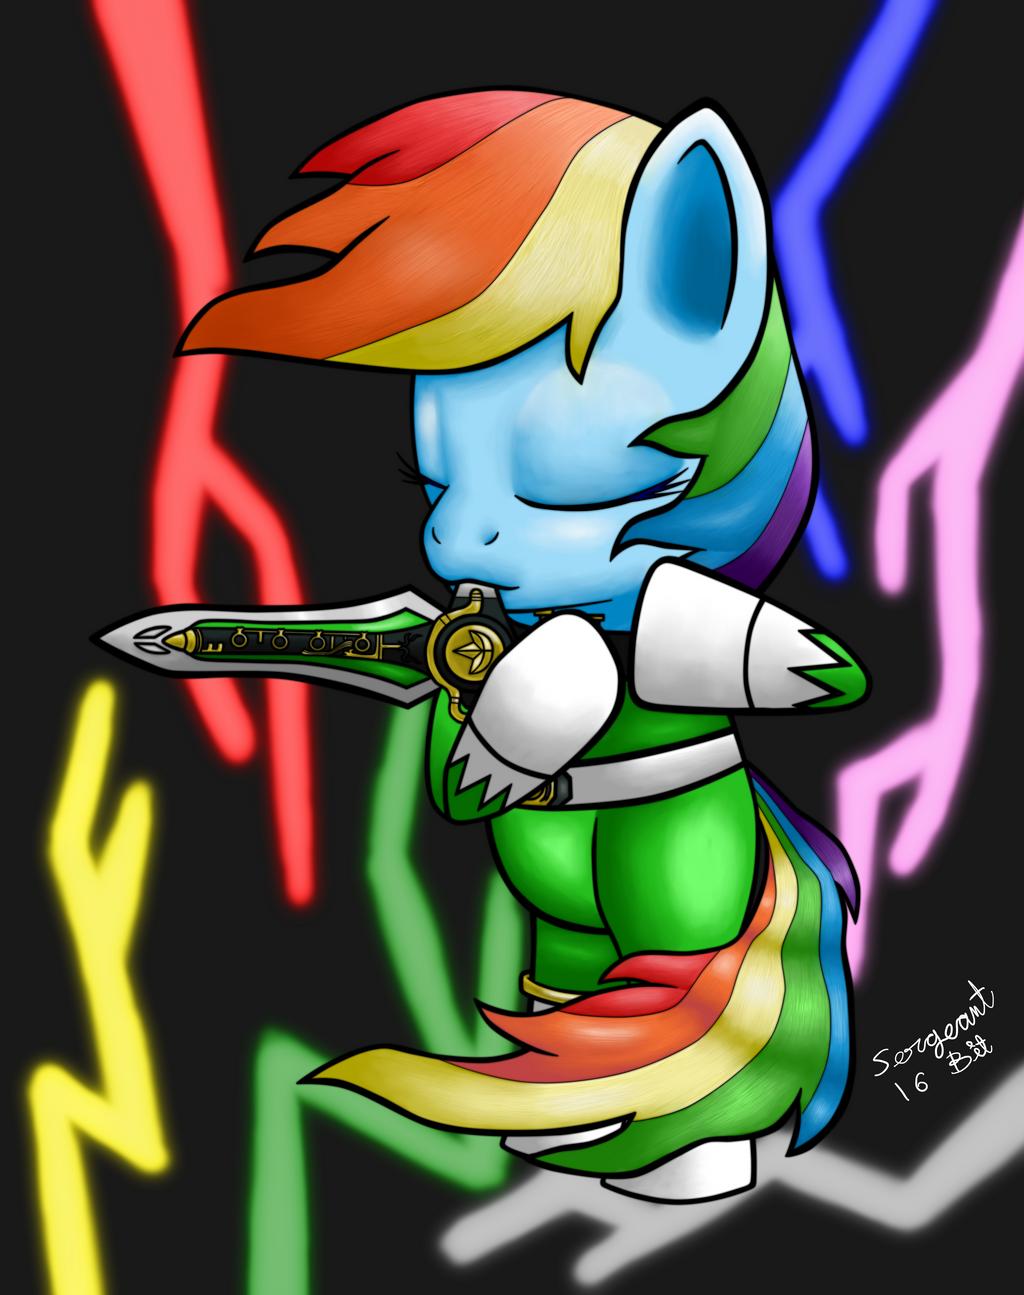 Mighty Morphin Rainbow Dash by sergeant16bit